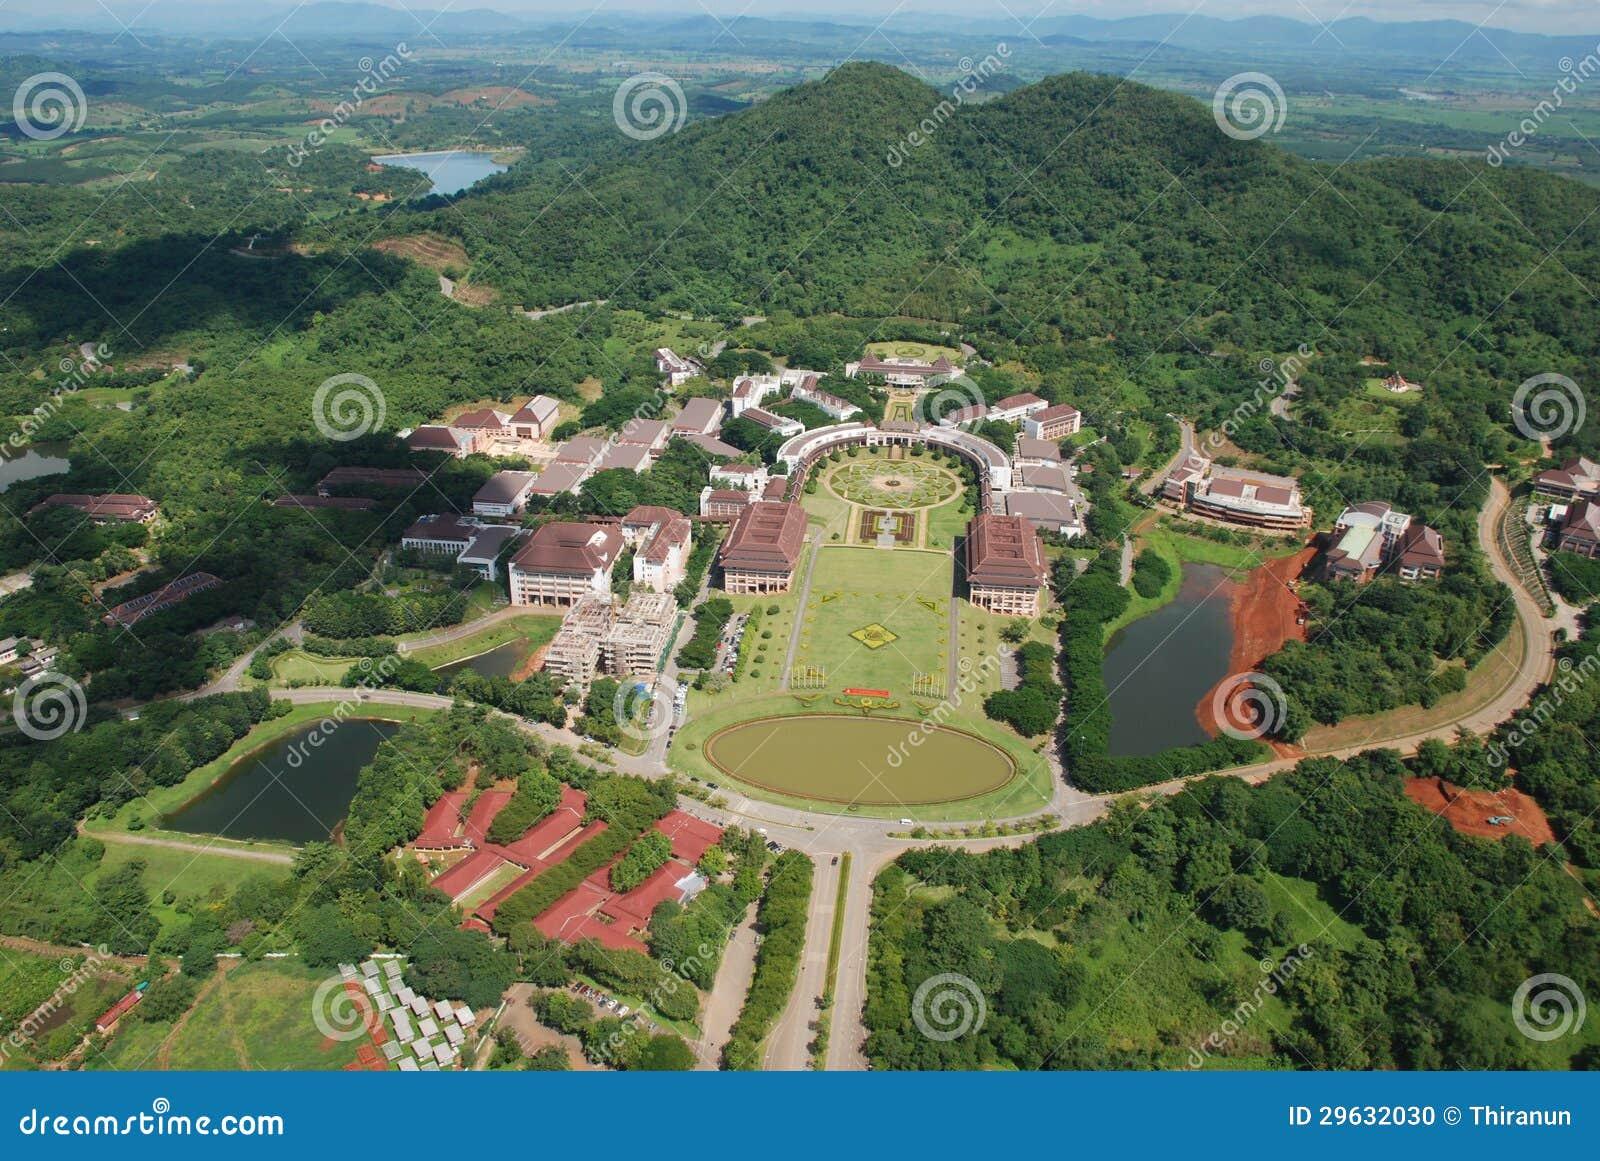 Mae Fah Luang University Stock Photo Image 29632030